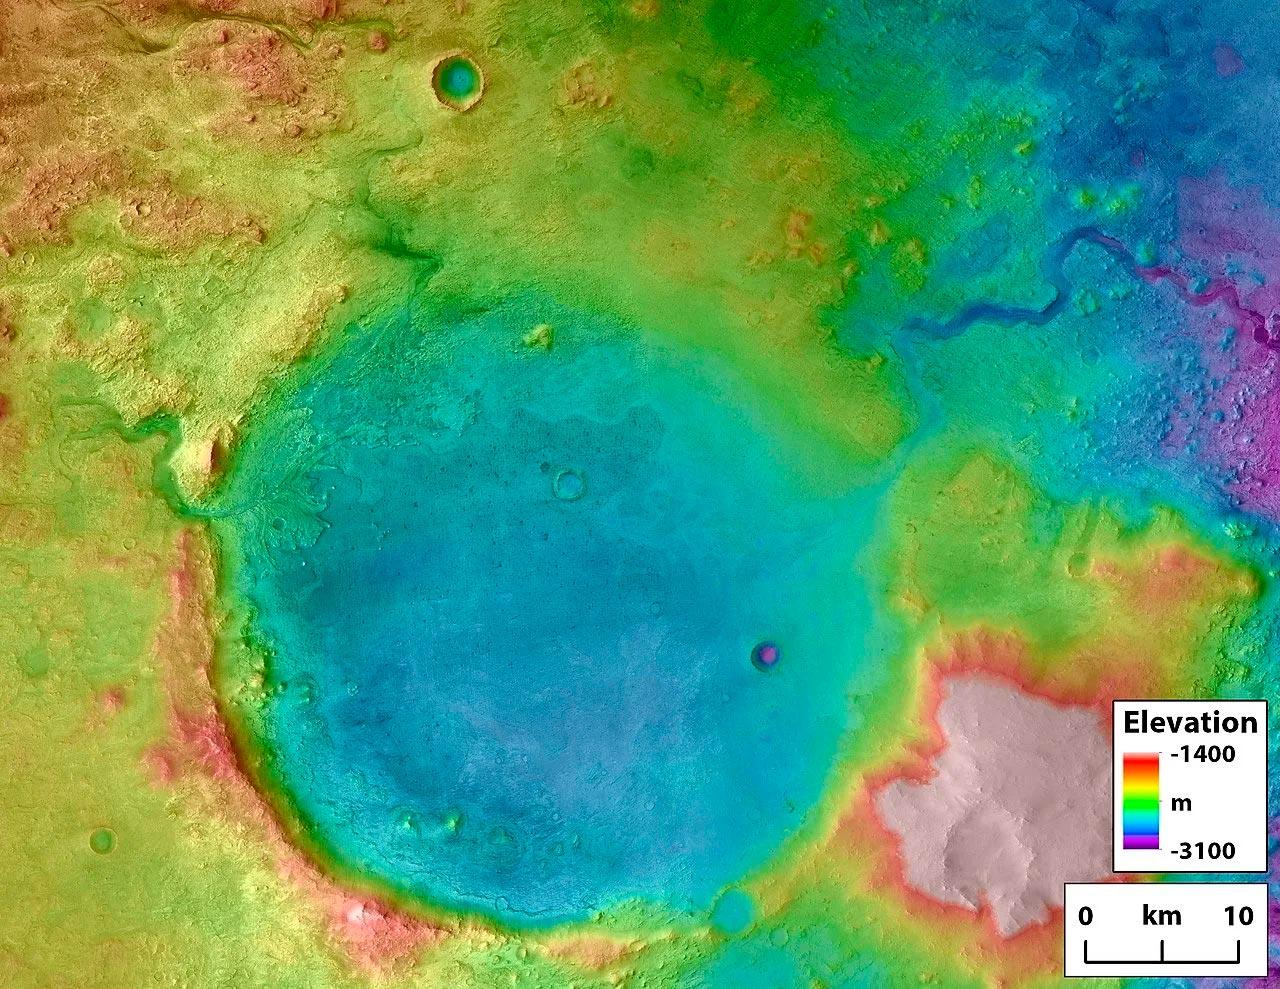 марсоход Perseverance и жизнь на марсе